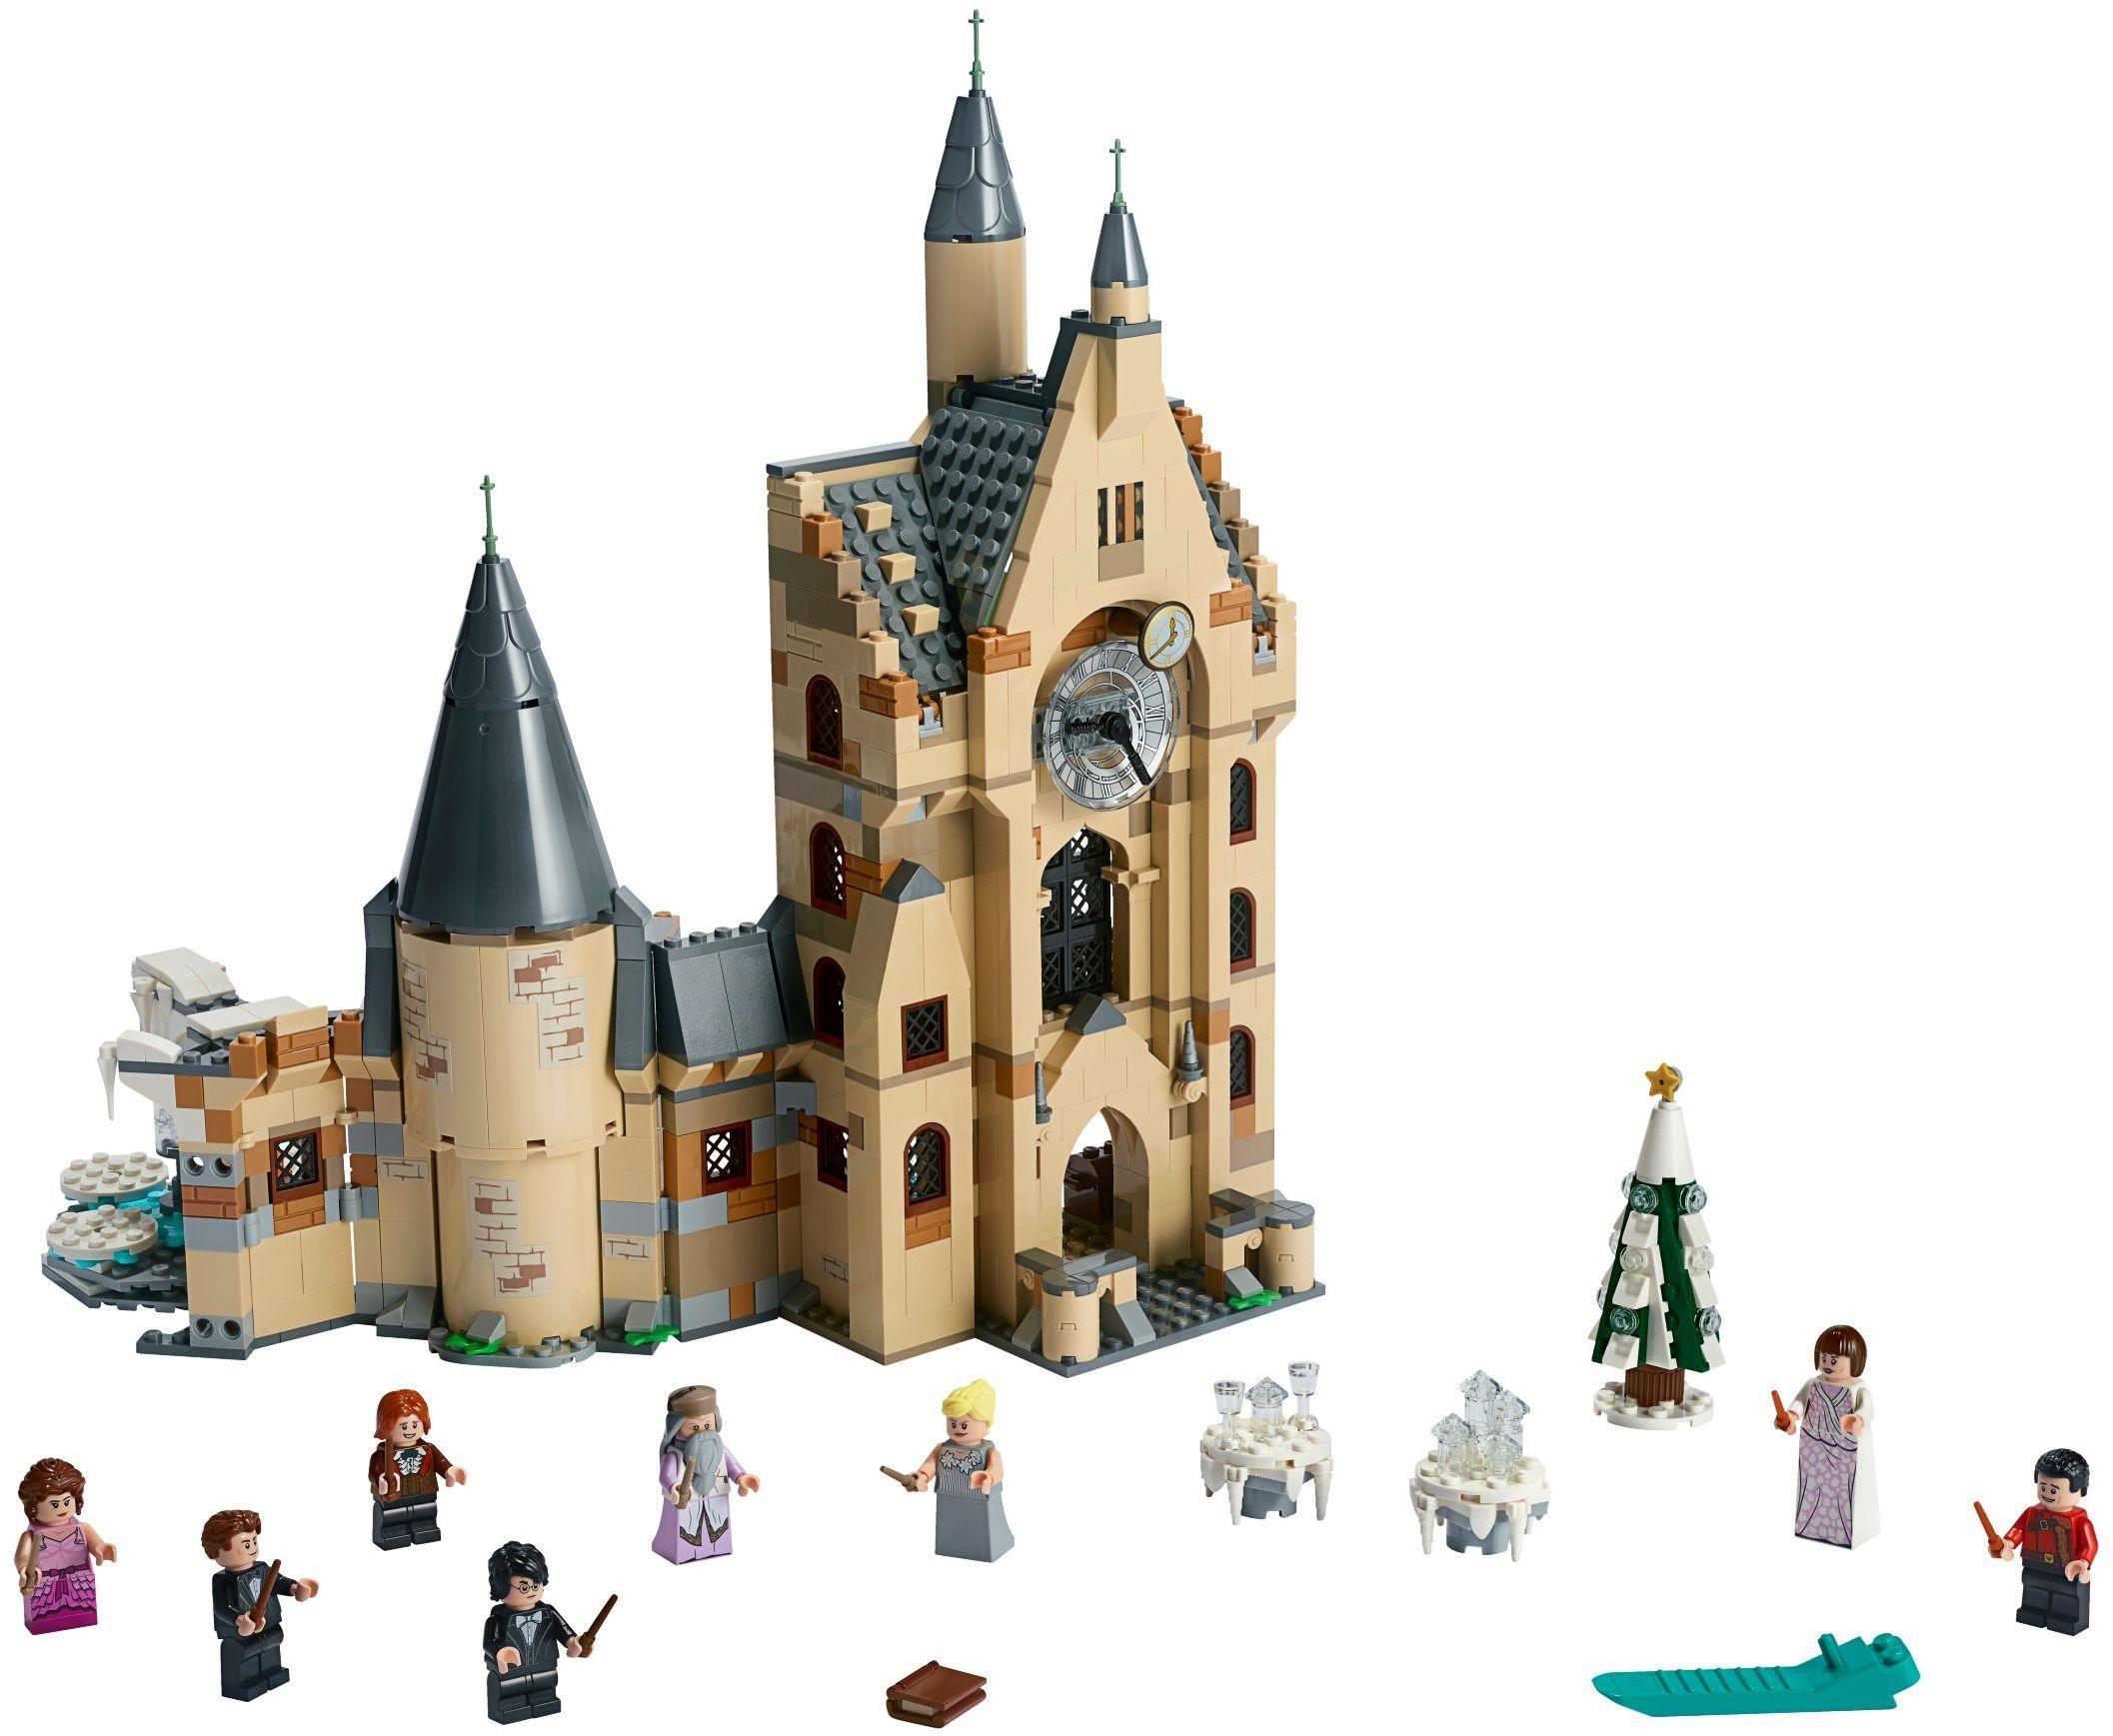 LEGO 75948 Harry Potter Hogwarts Clock Tower Hogwarts Castle New in Sealed Box